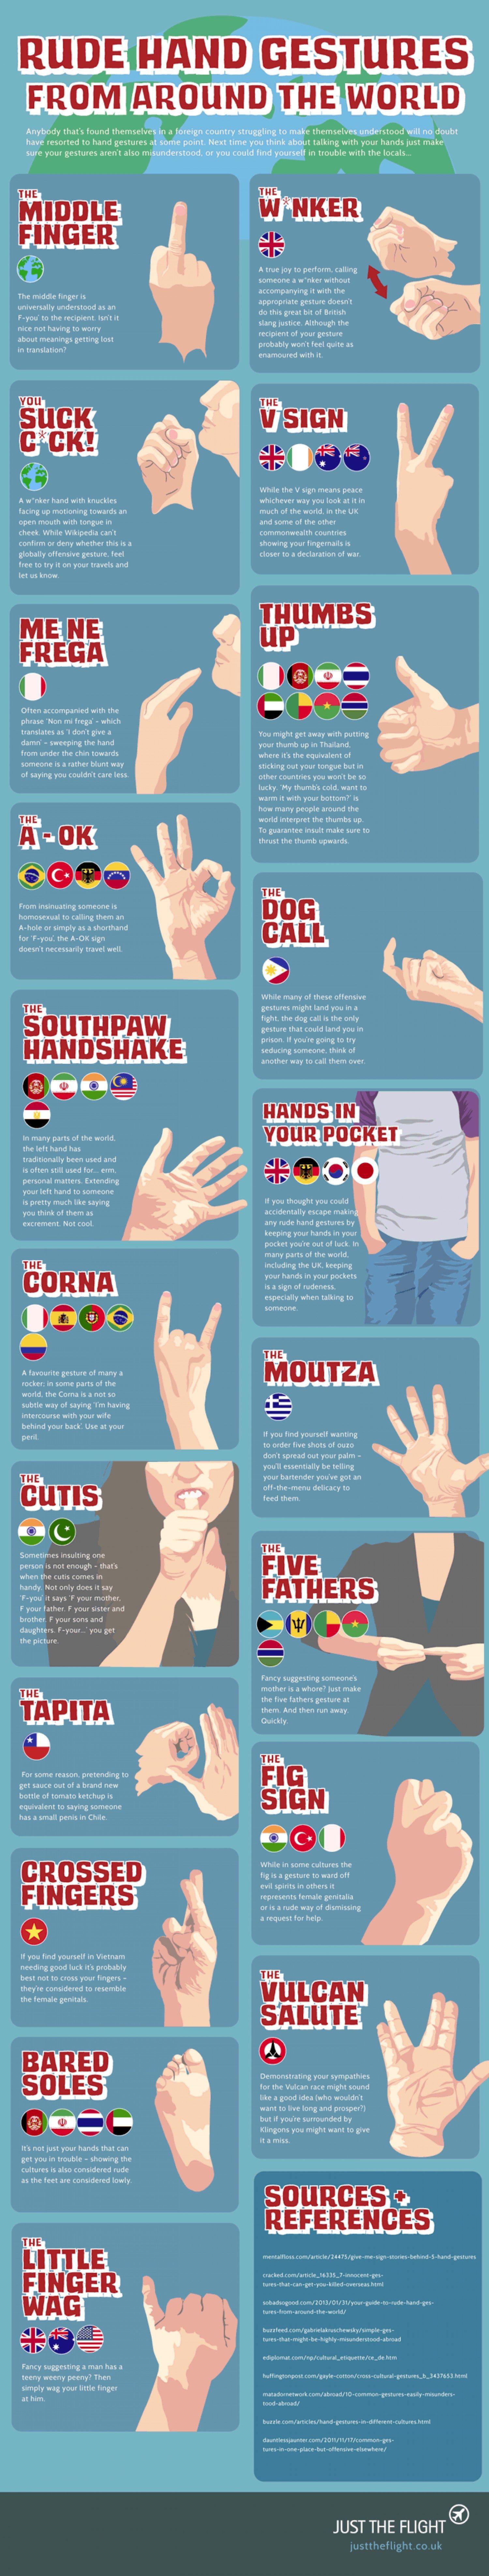 fula handgester